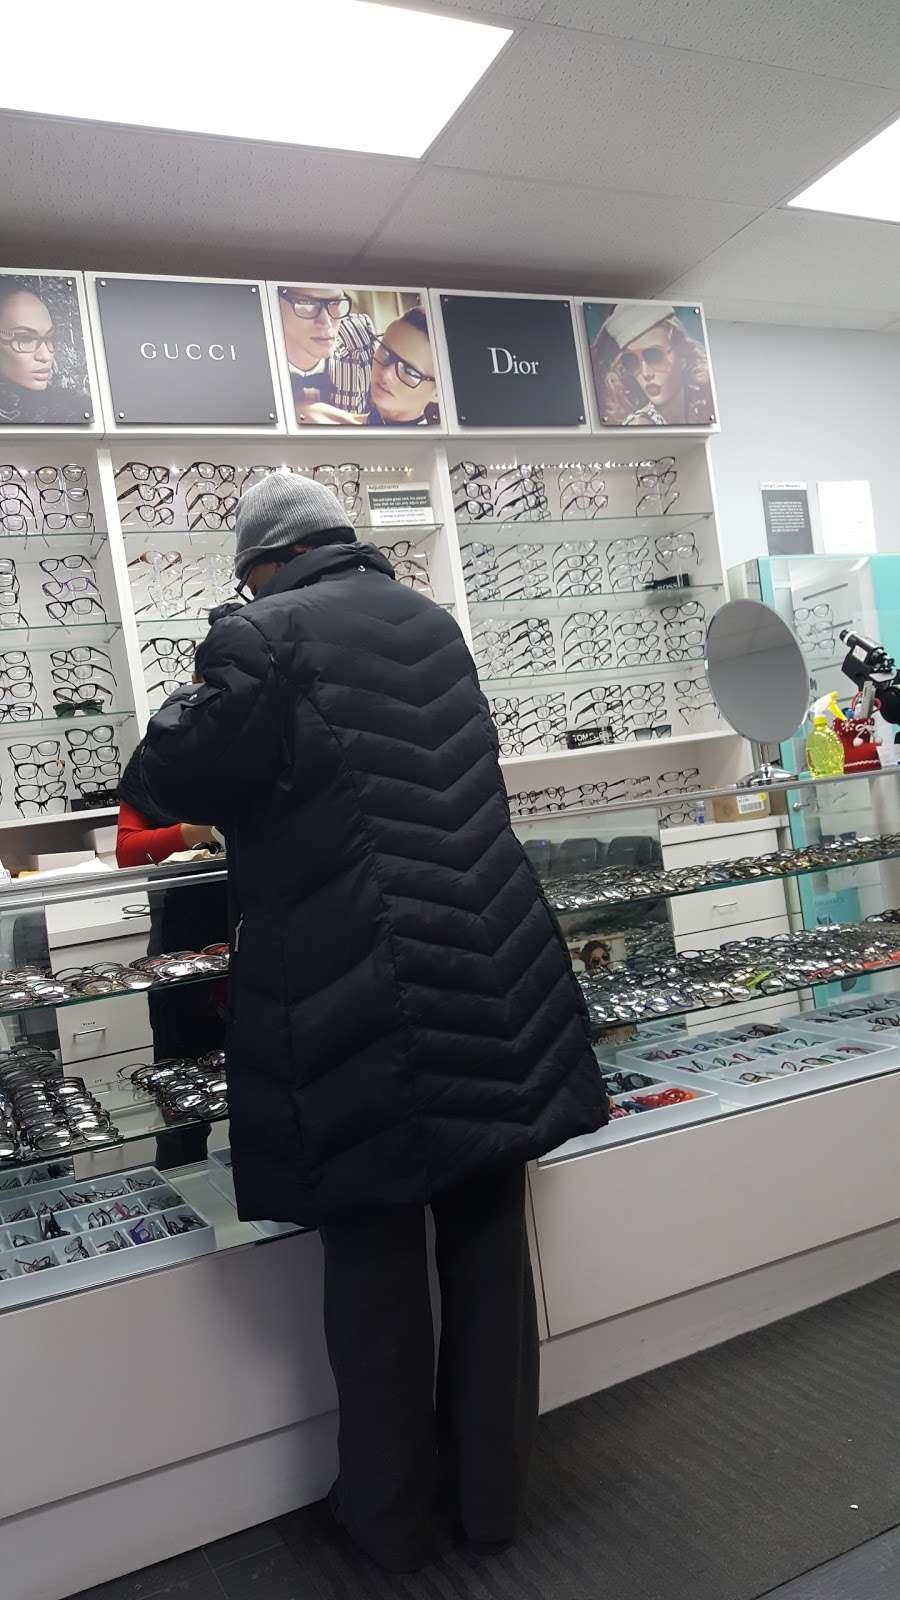 Cohens Fashion Optical - store  | Photo 4 of 7 | Address: 1704 Church Ave, Brooklyn, NY 11226, USA | Phone: (718) 684-5000